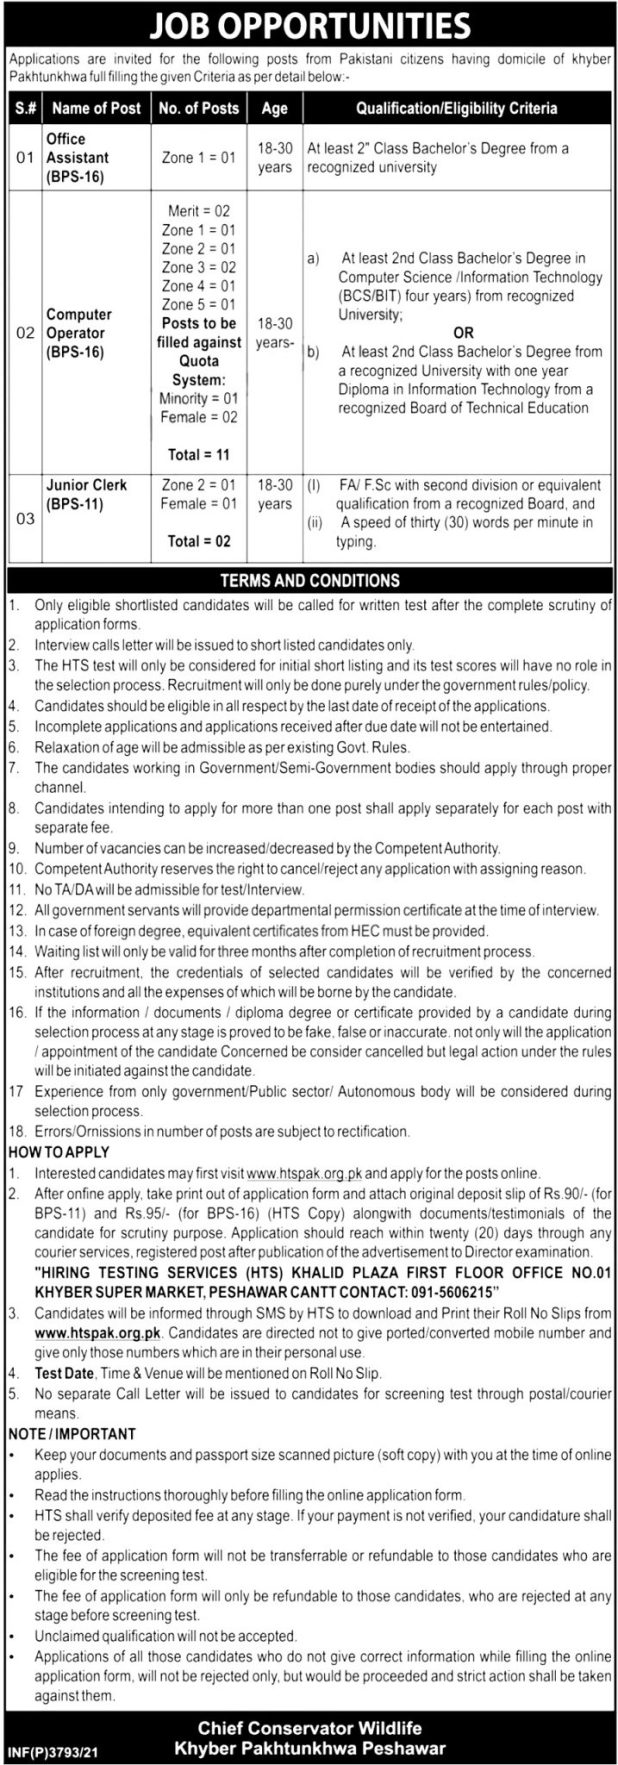 Wildlife Department Khyber Pakhtunkhwa HTS Jobs 2021 Online Application Form Eligibility Criteria